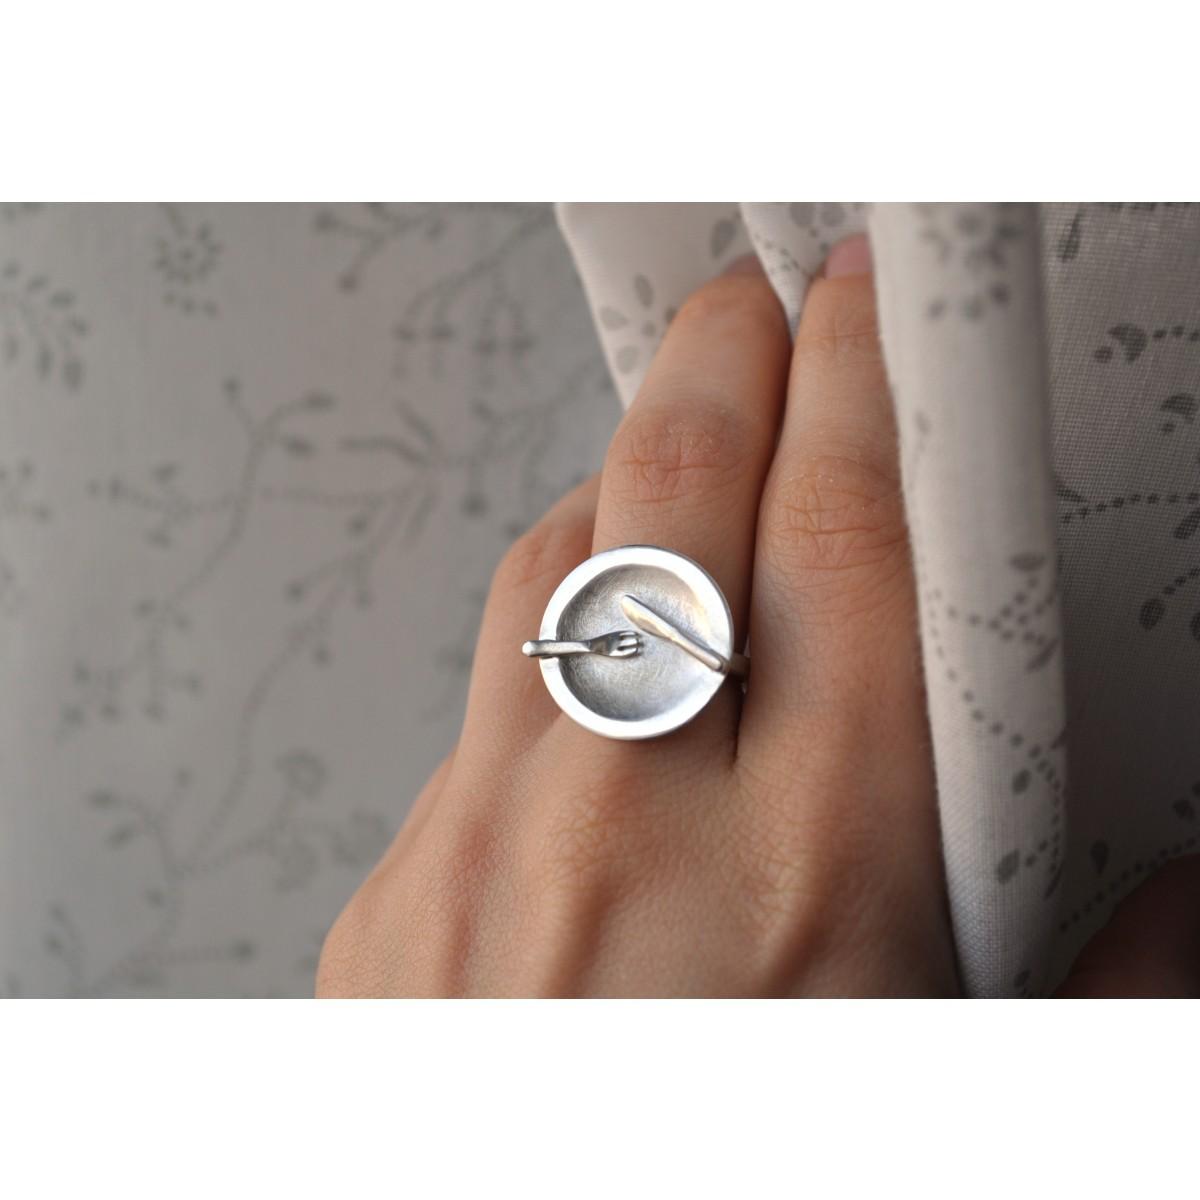 "DOPPELLUDWIG  TAFELSILBER Ring ""Teller"" aus Silber"